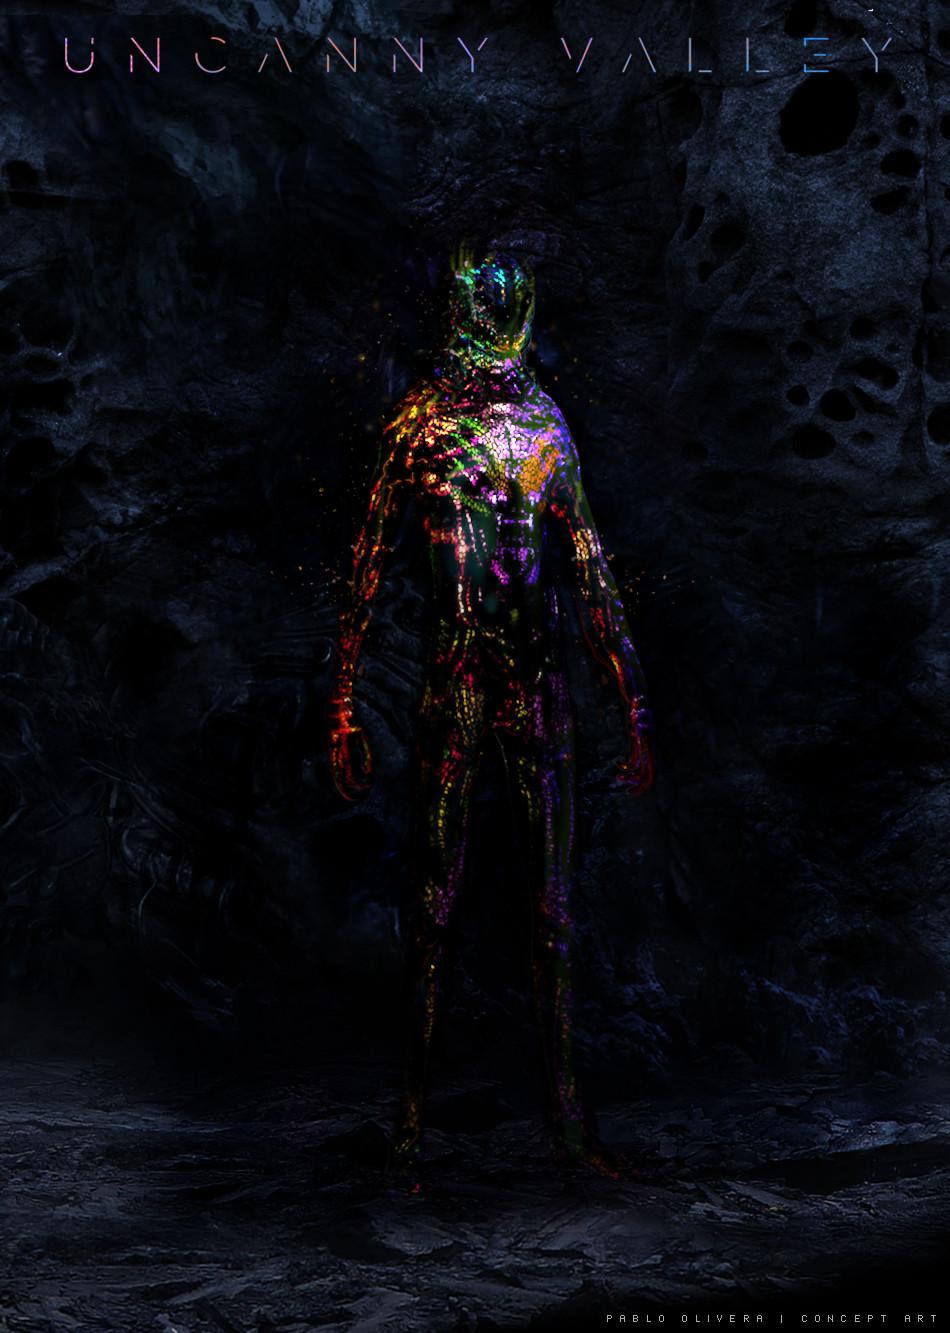 Pablo olivera uncanny valley character design alien 19